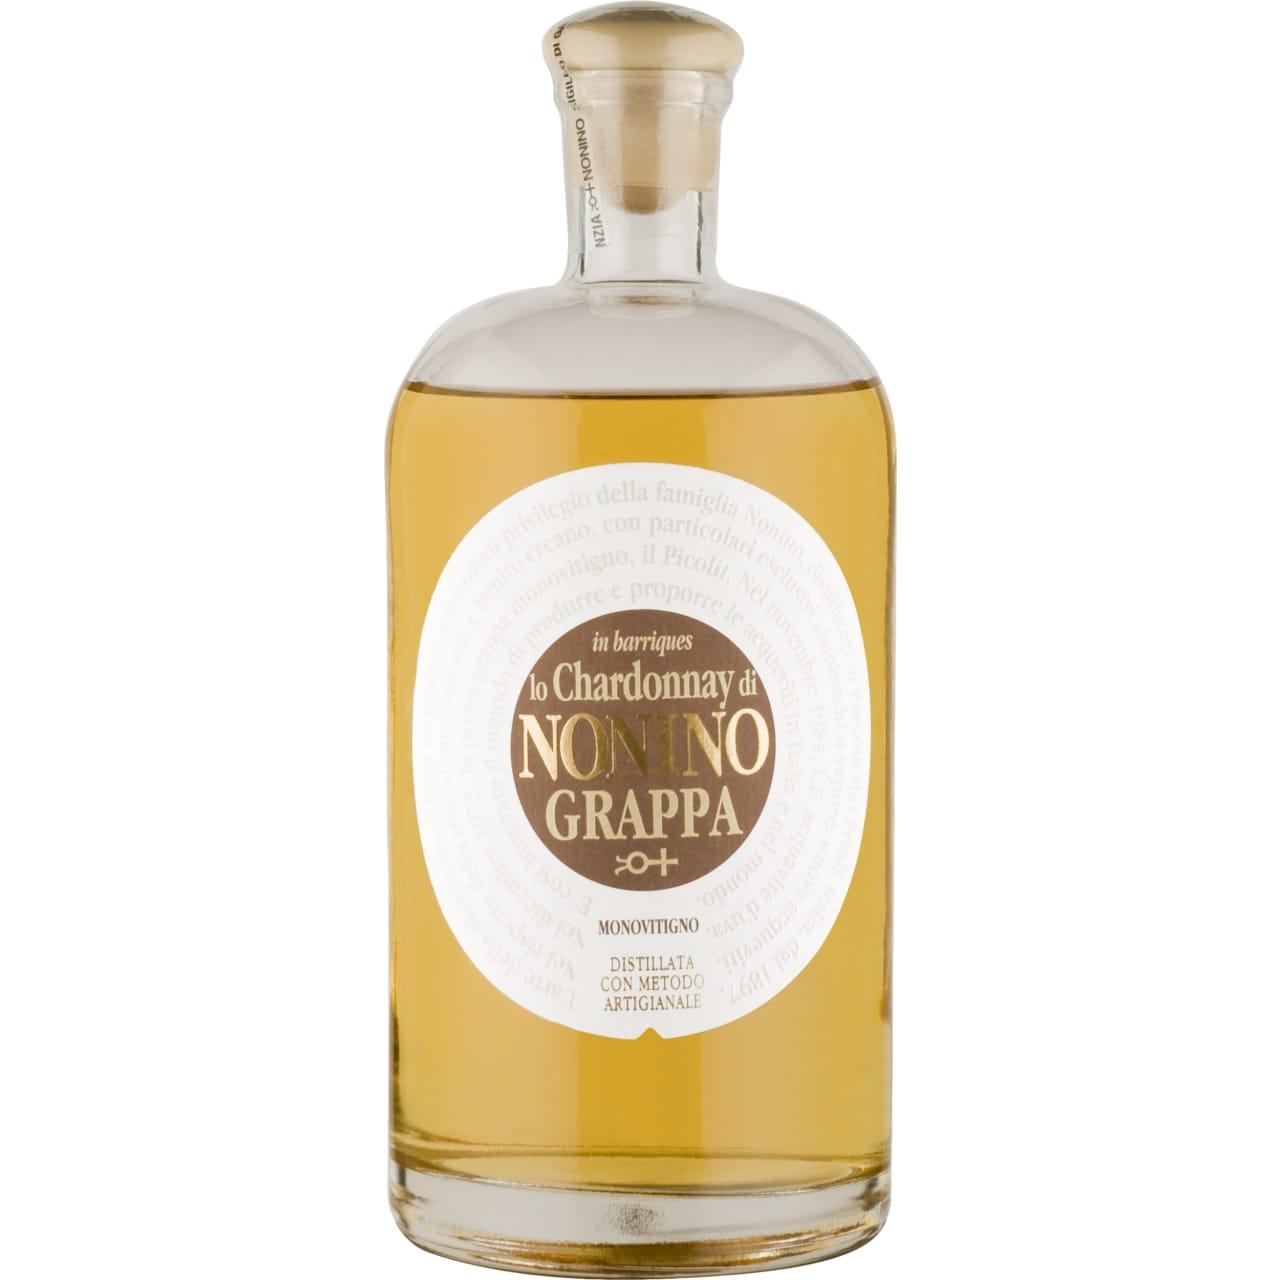 Product Image - Nonino Grappa Lo Chardonnay